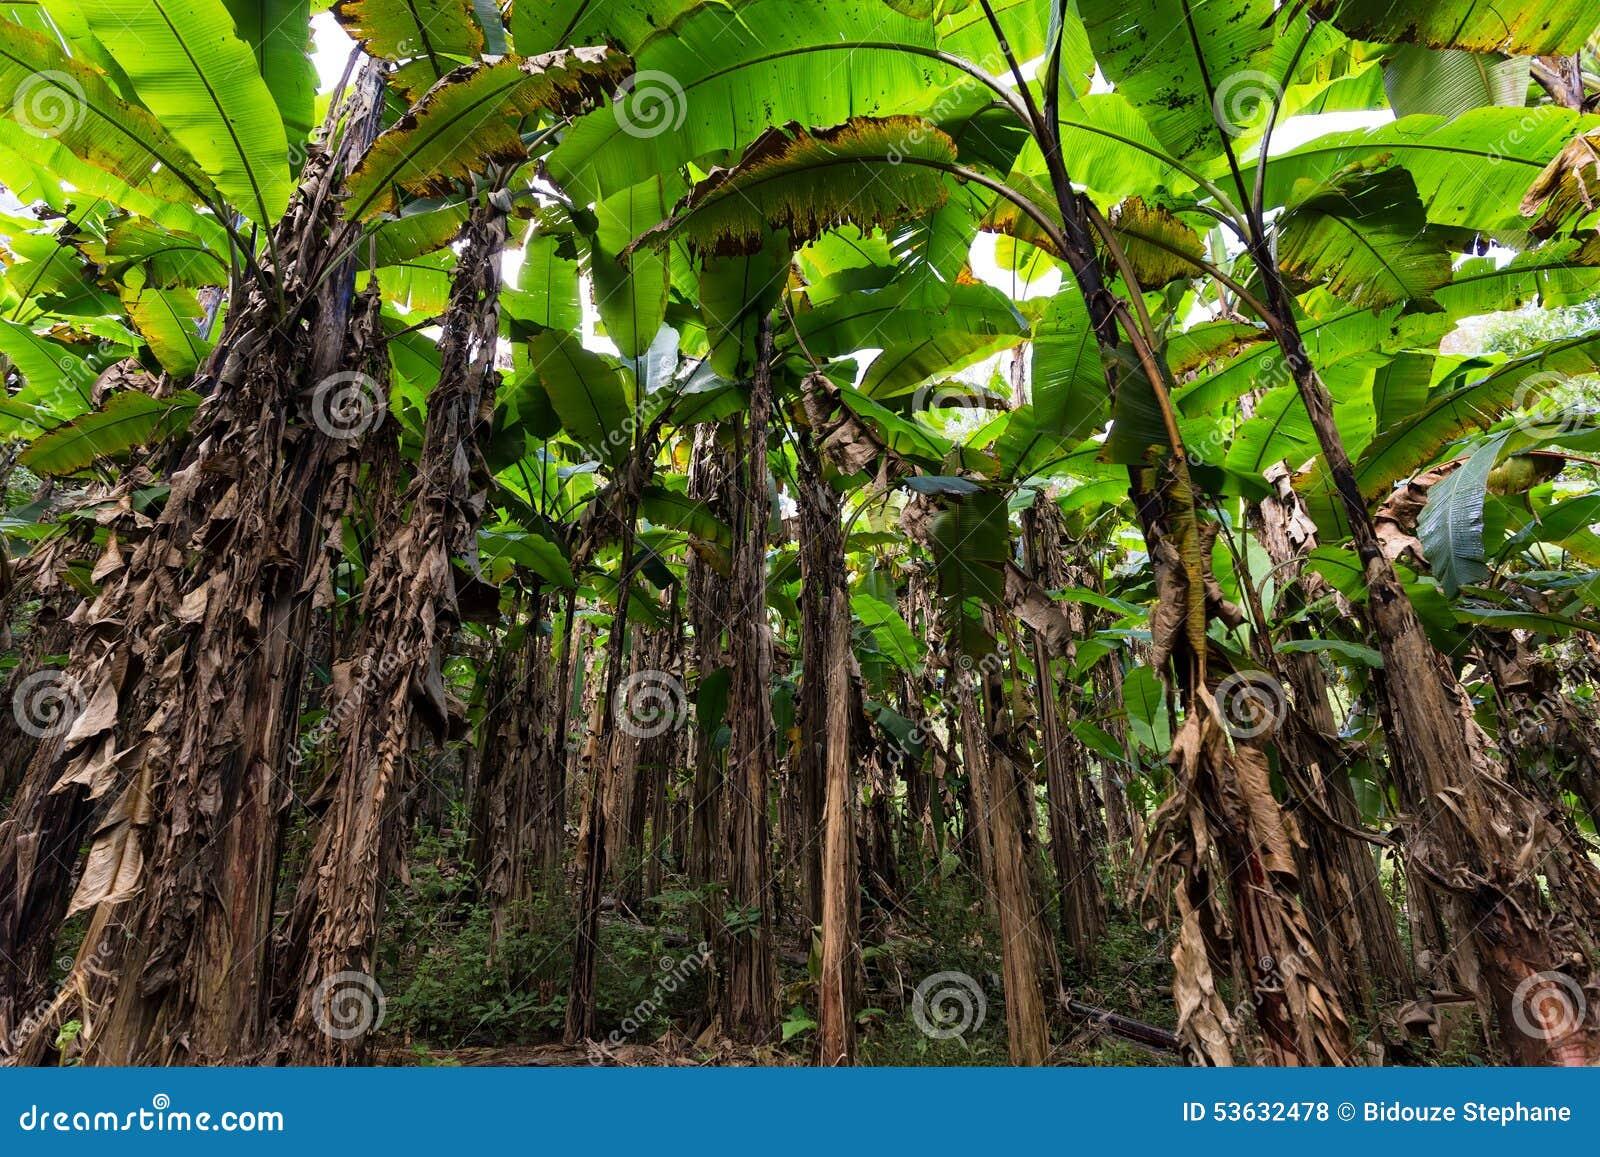 plantation de bananier photo stock image 53632478. Black Bedroom Furniture Sets. Home Design Ideas